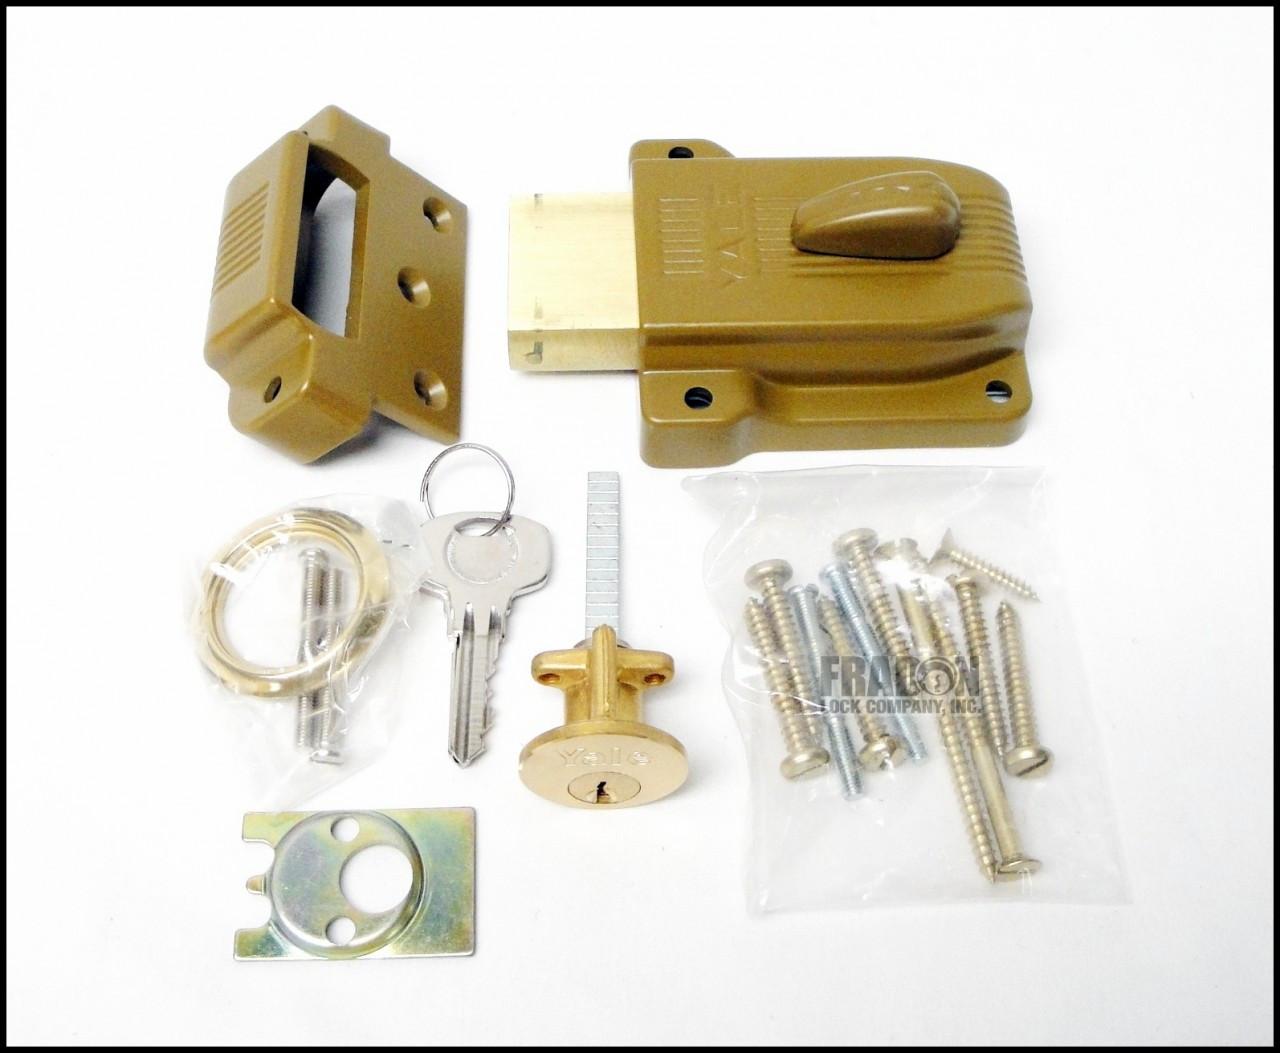 Yale 112 Heavy Duty Rim Lock Deadbolt Standard Angle